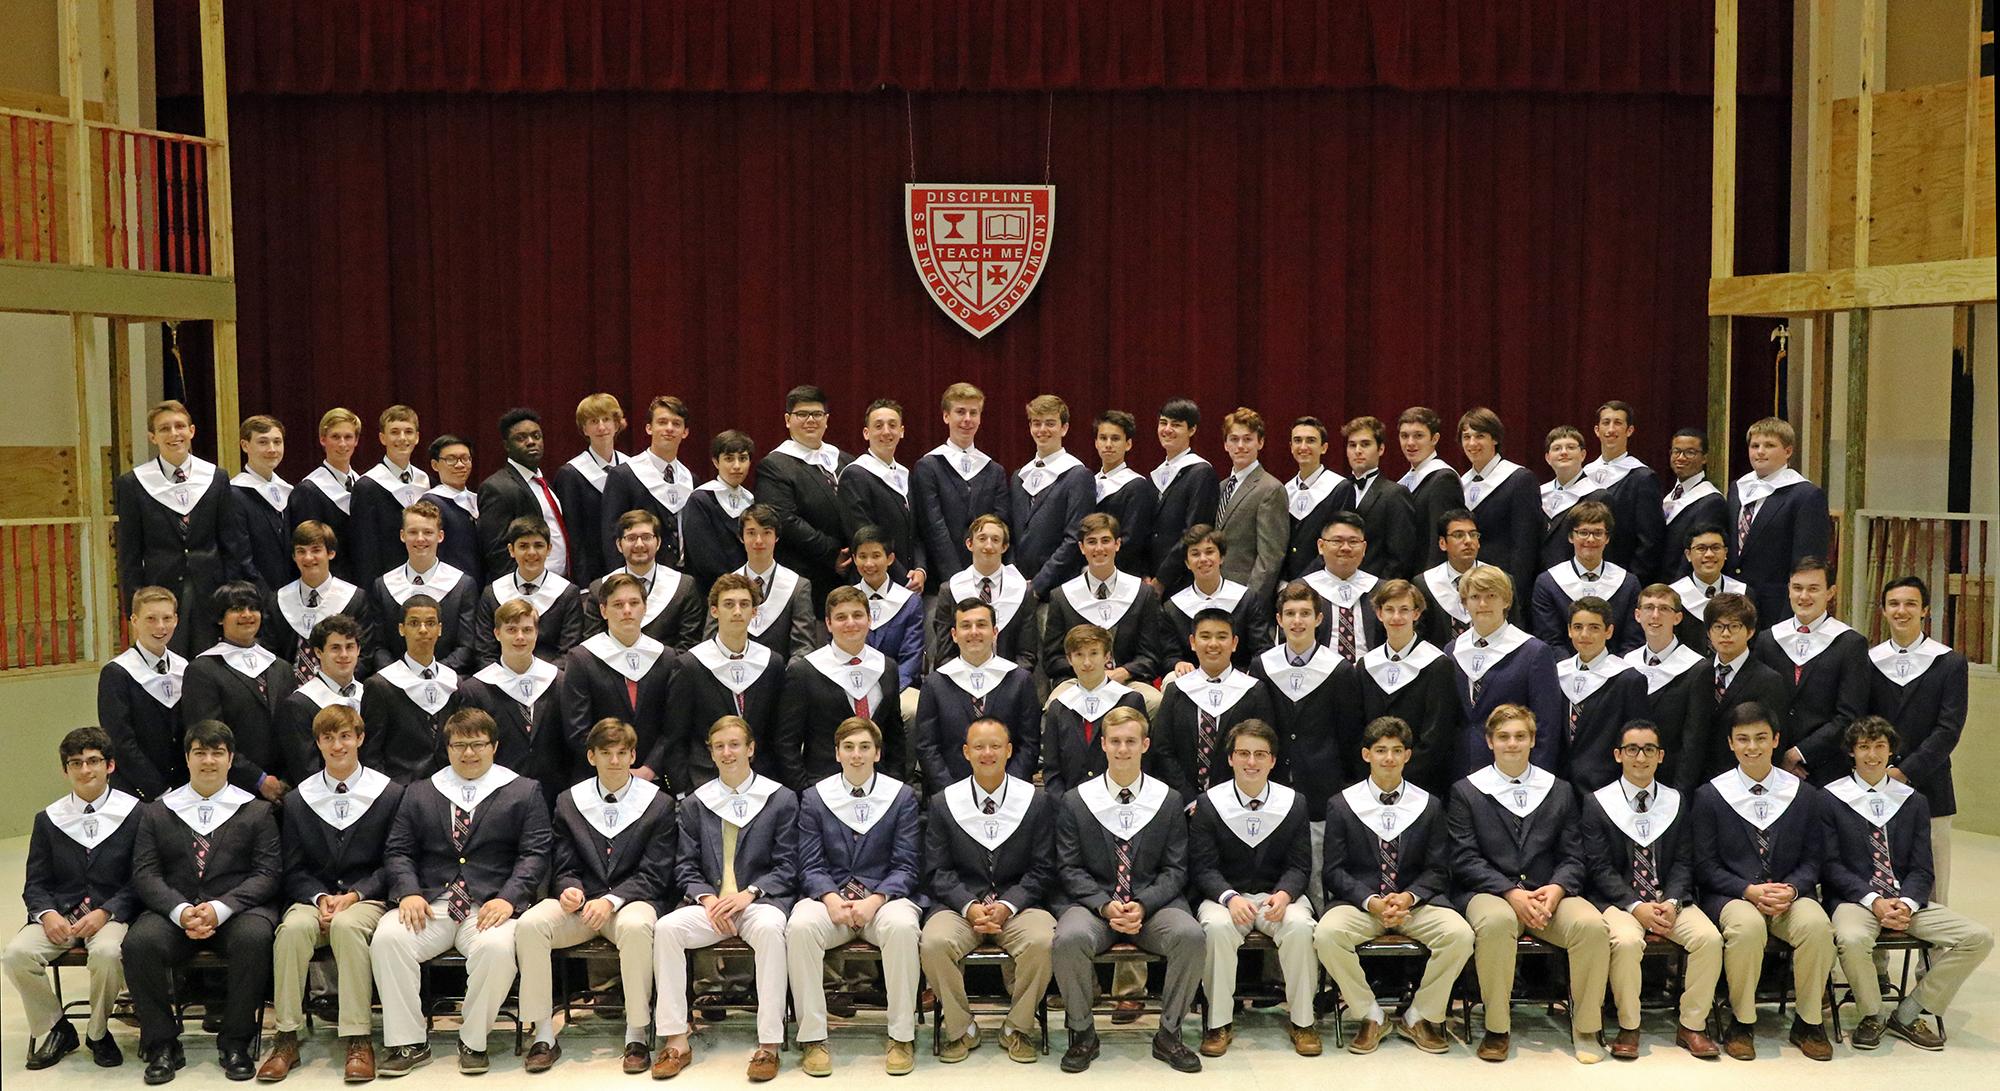 high school national honor society essays